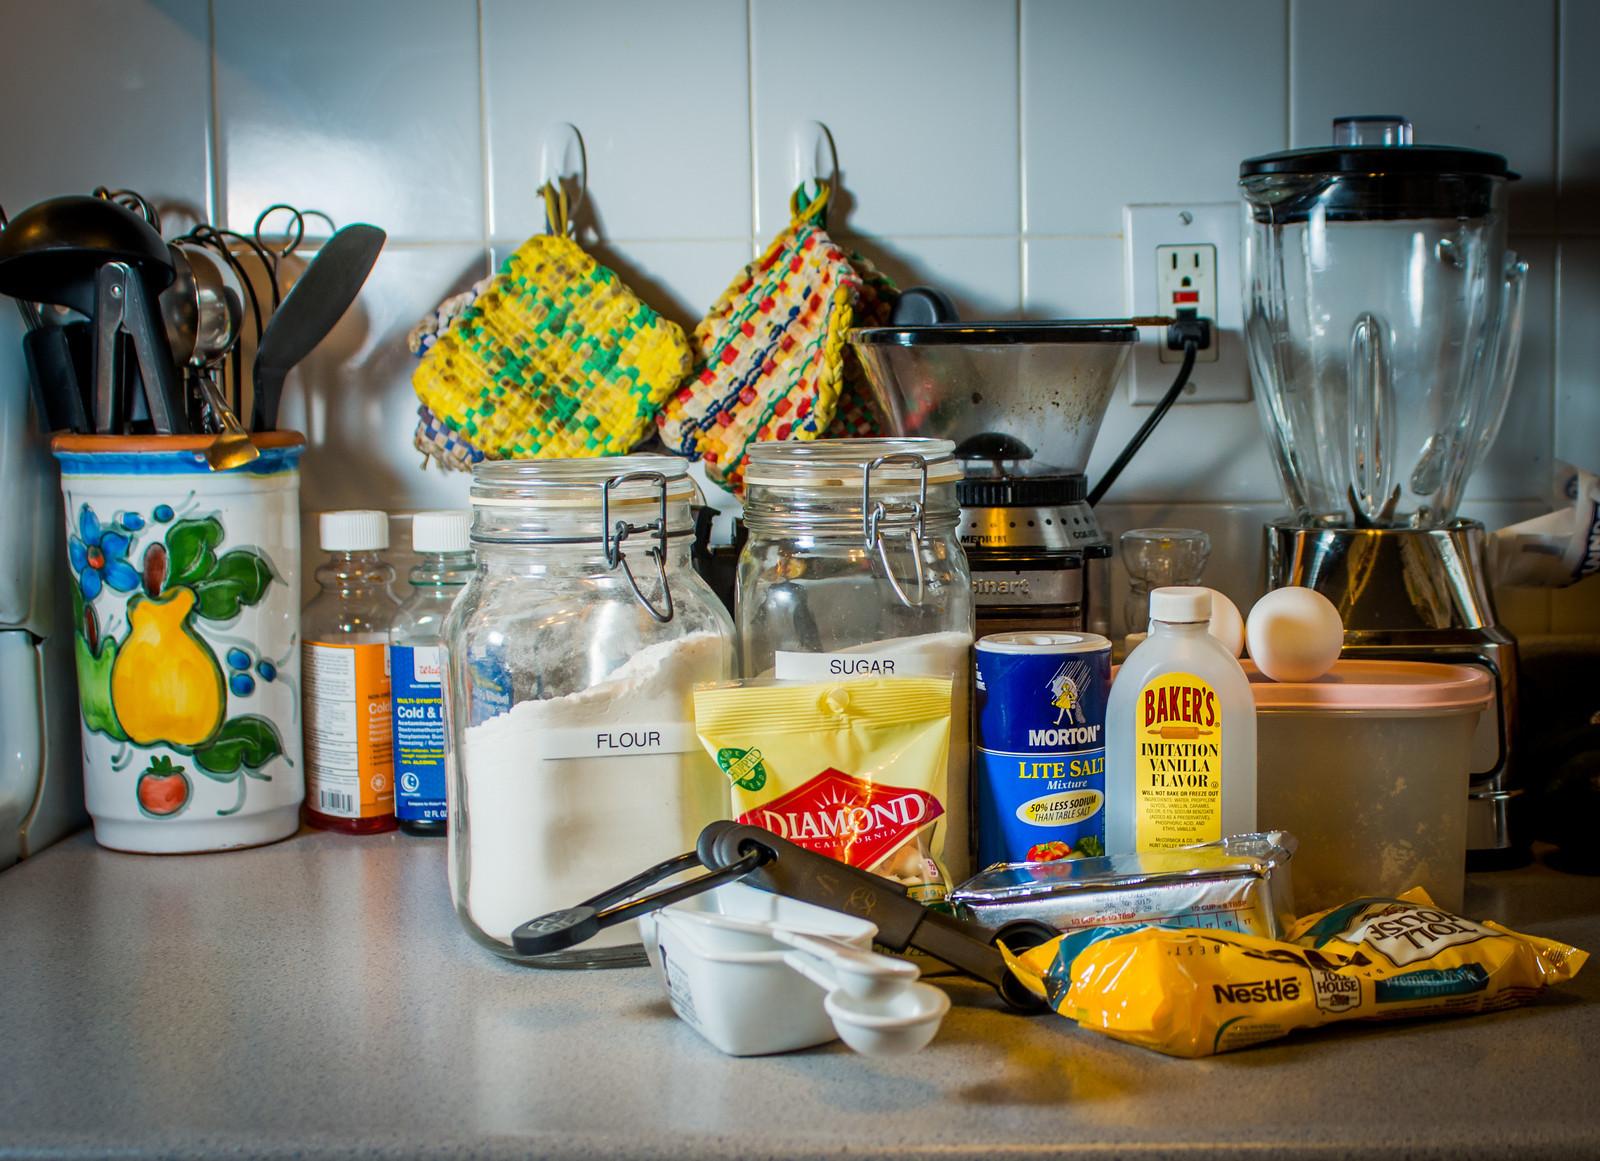 20140302-Baking Cookies-PMG_4606-X3.jpg